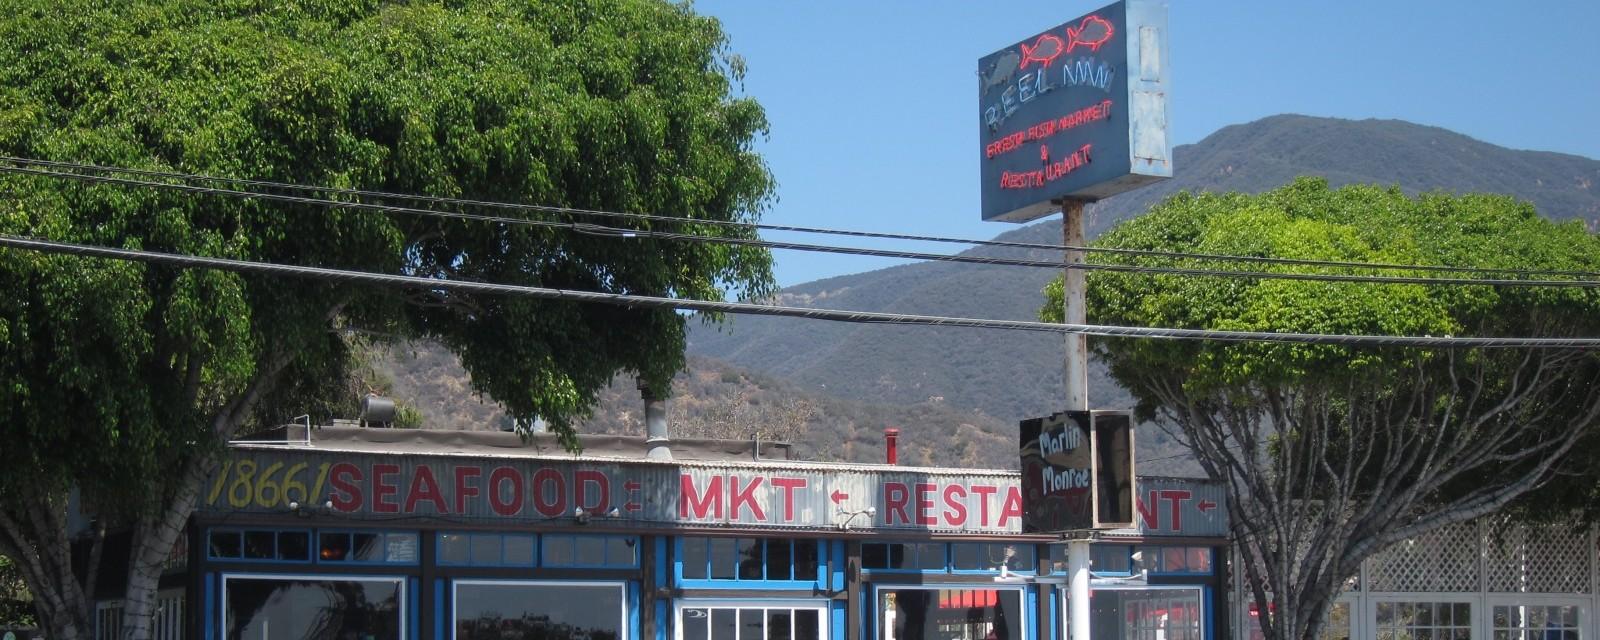 reel-inn-malibu-restaurant_all-things-malibu